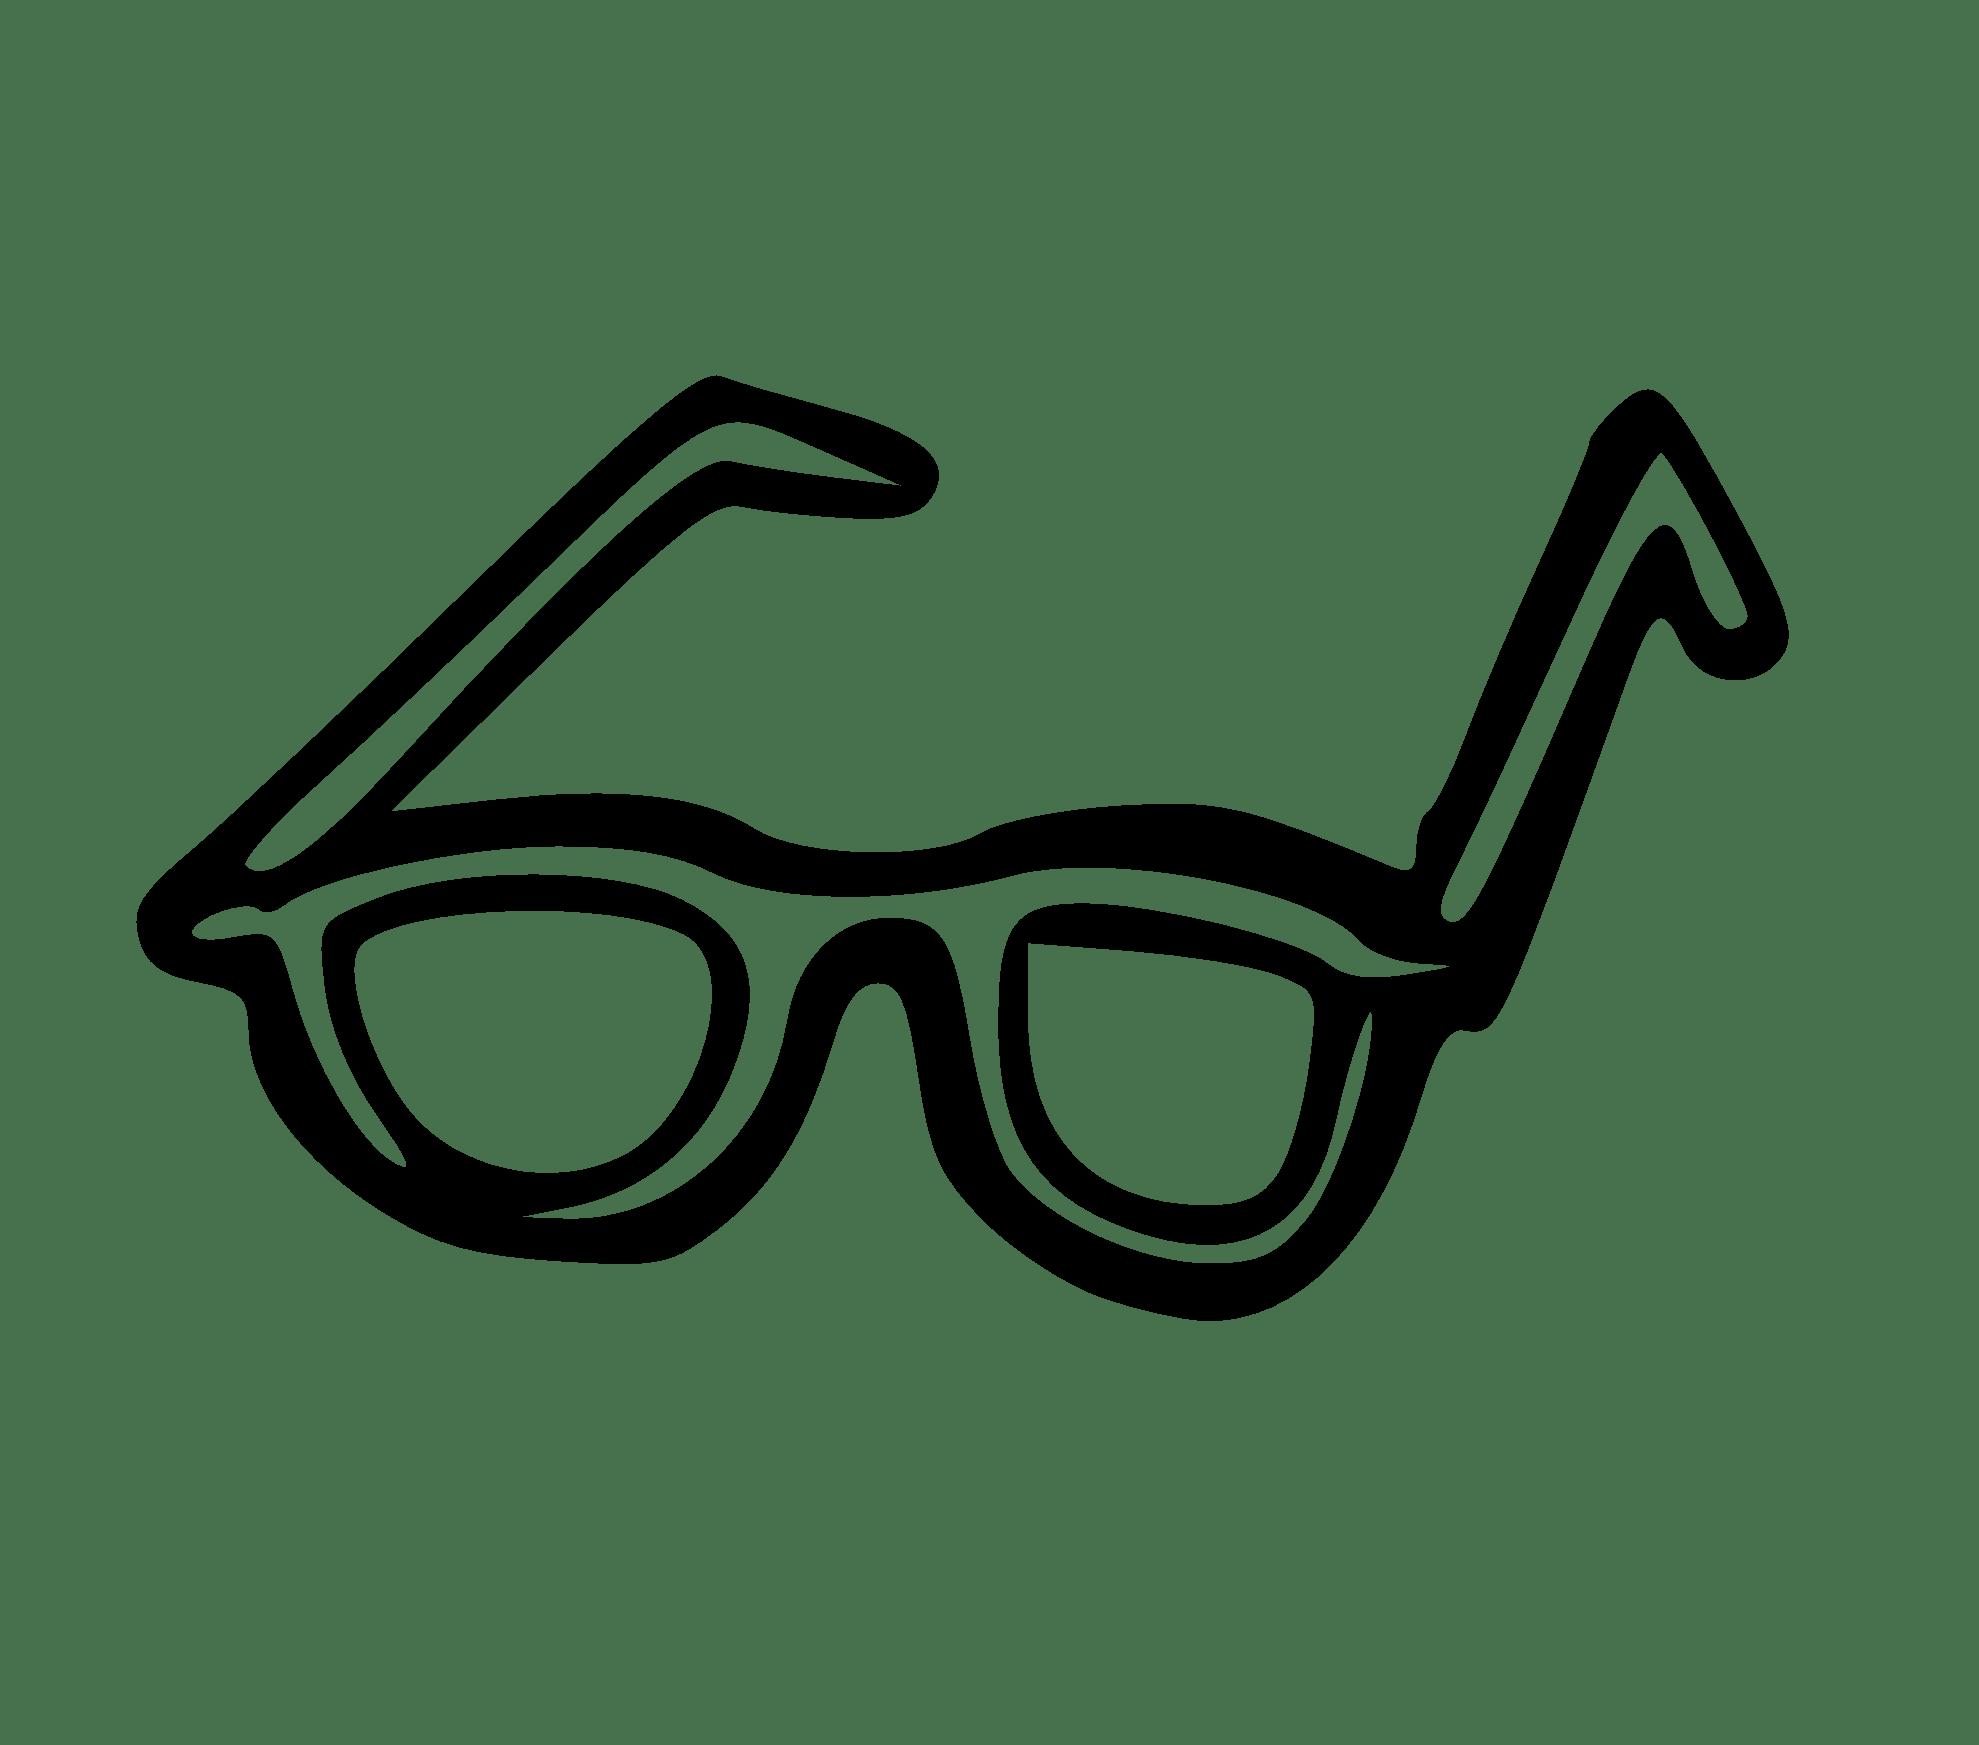 Sunglasses Clipart Black And White Clipart Panda